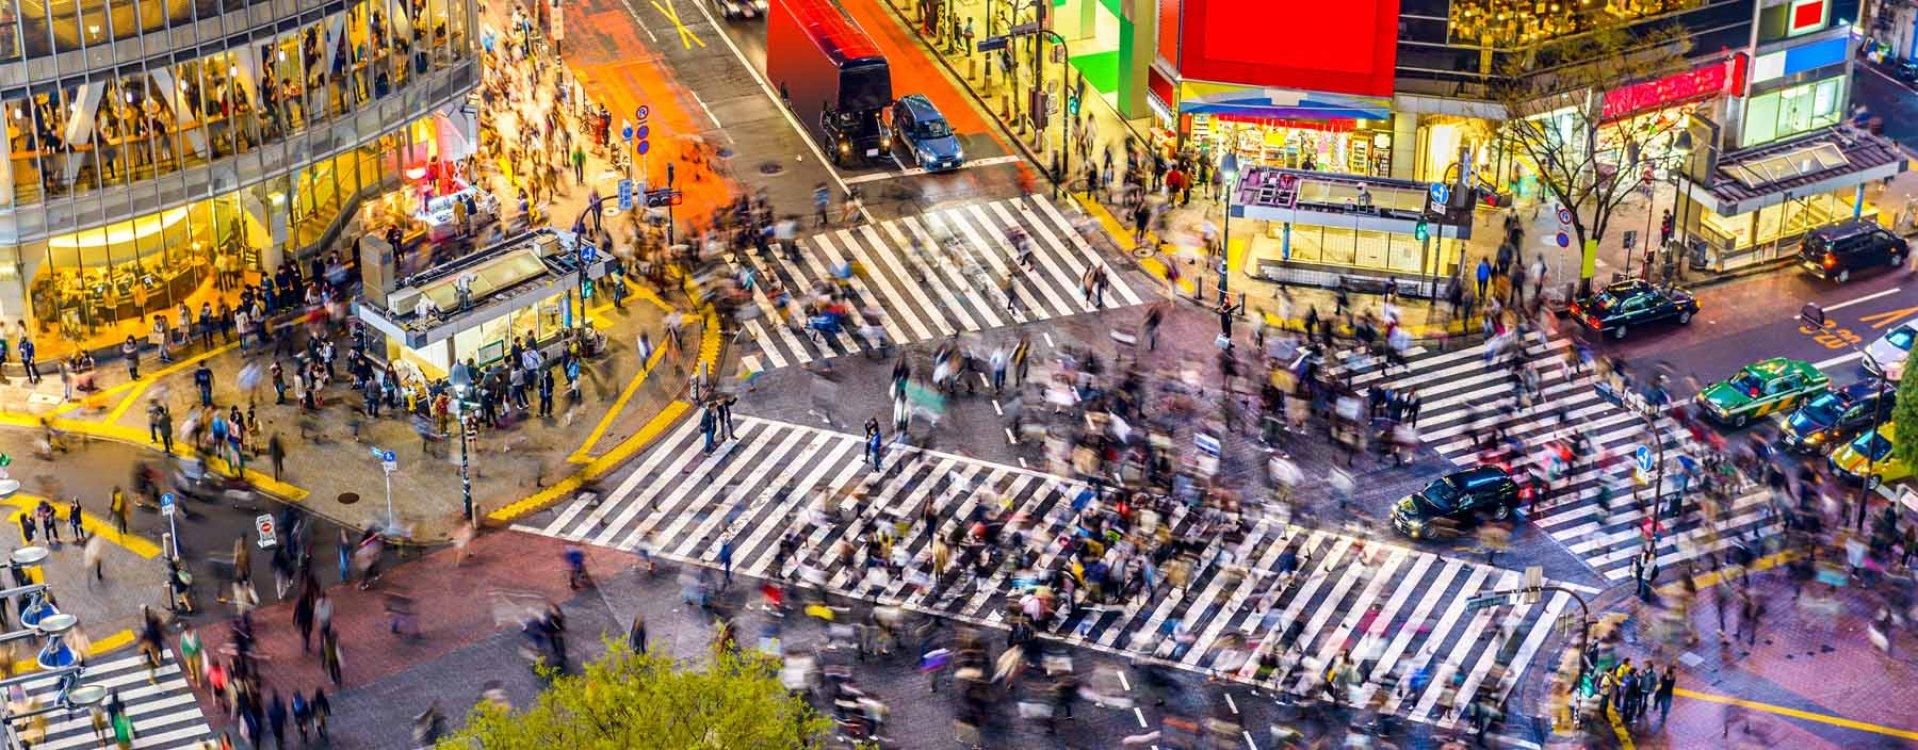 Tokyo, crosswalk in wijk Shibuya